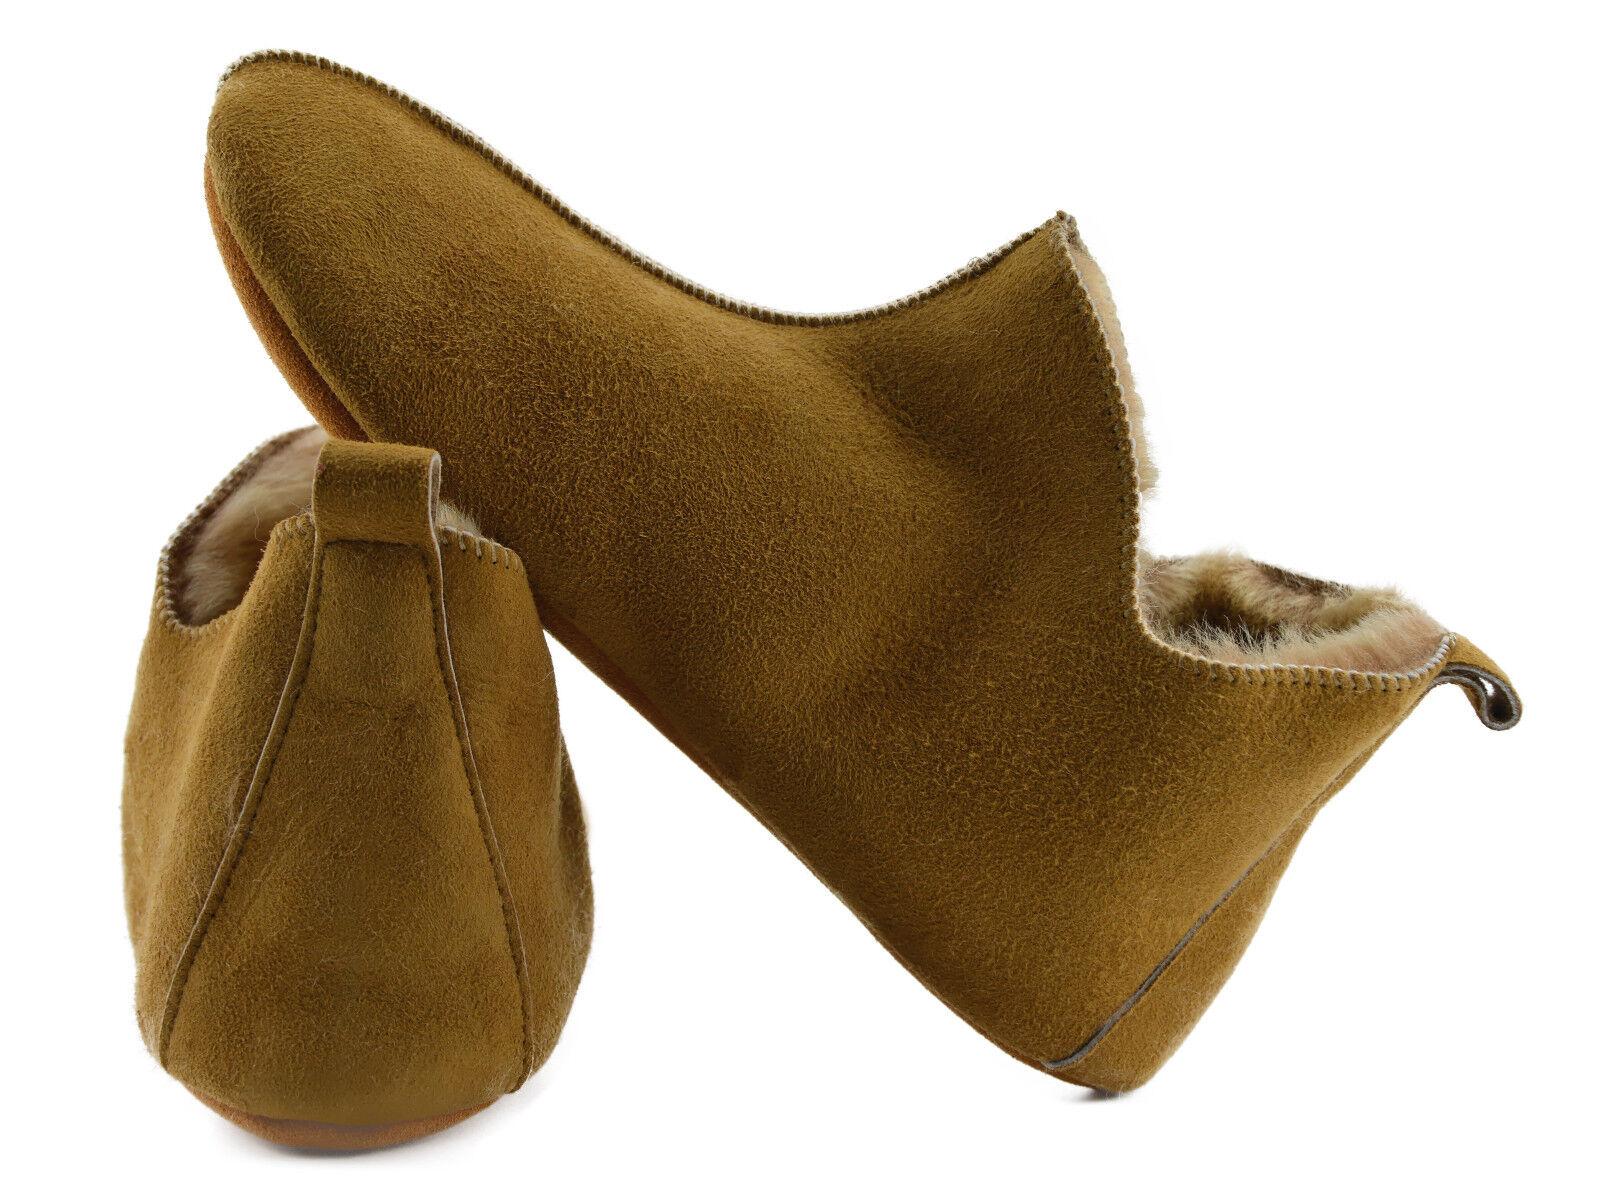 Sheepskin Slipper Uomo/Donna, House Shoes Moccasin,100% natural, Uomo/Donna, Slipper Unisex Maccasin 5f25f7